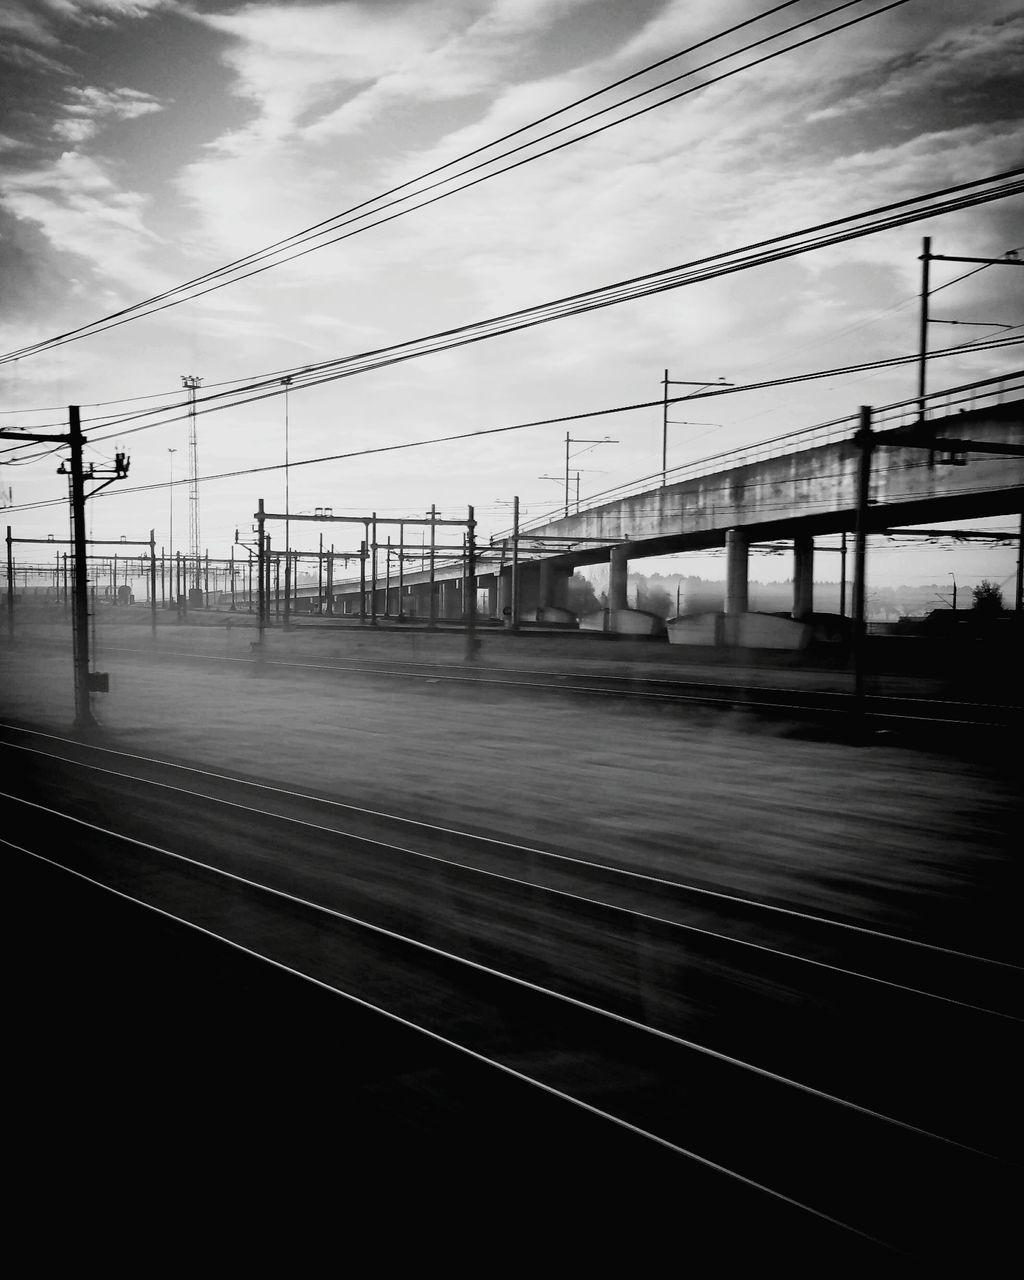 cable, rail transportation, transportation, sky, power line, connection, railroad track, public transportation, train - vehicle, no people, electricity pylon, day, outdoors, parallel, technology, nature